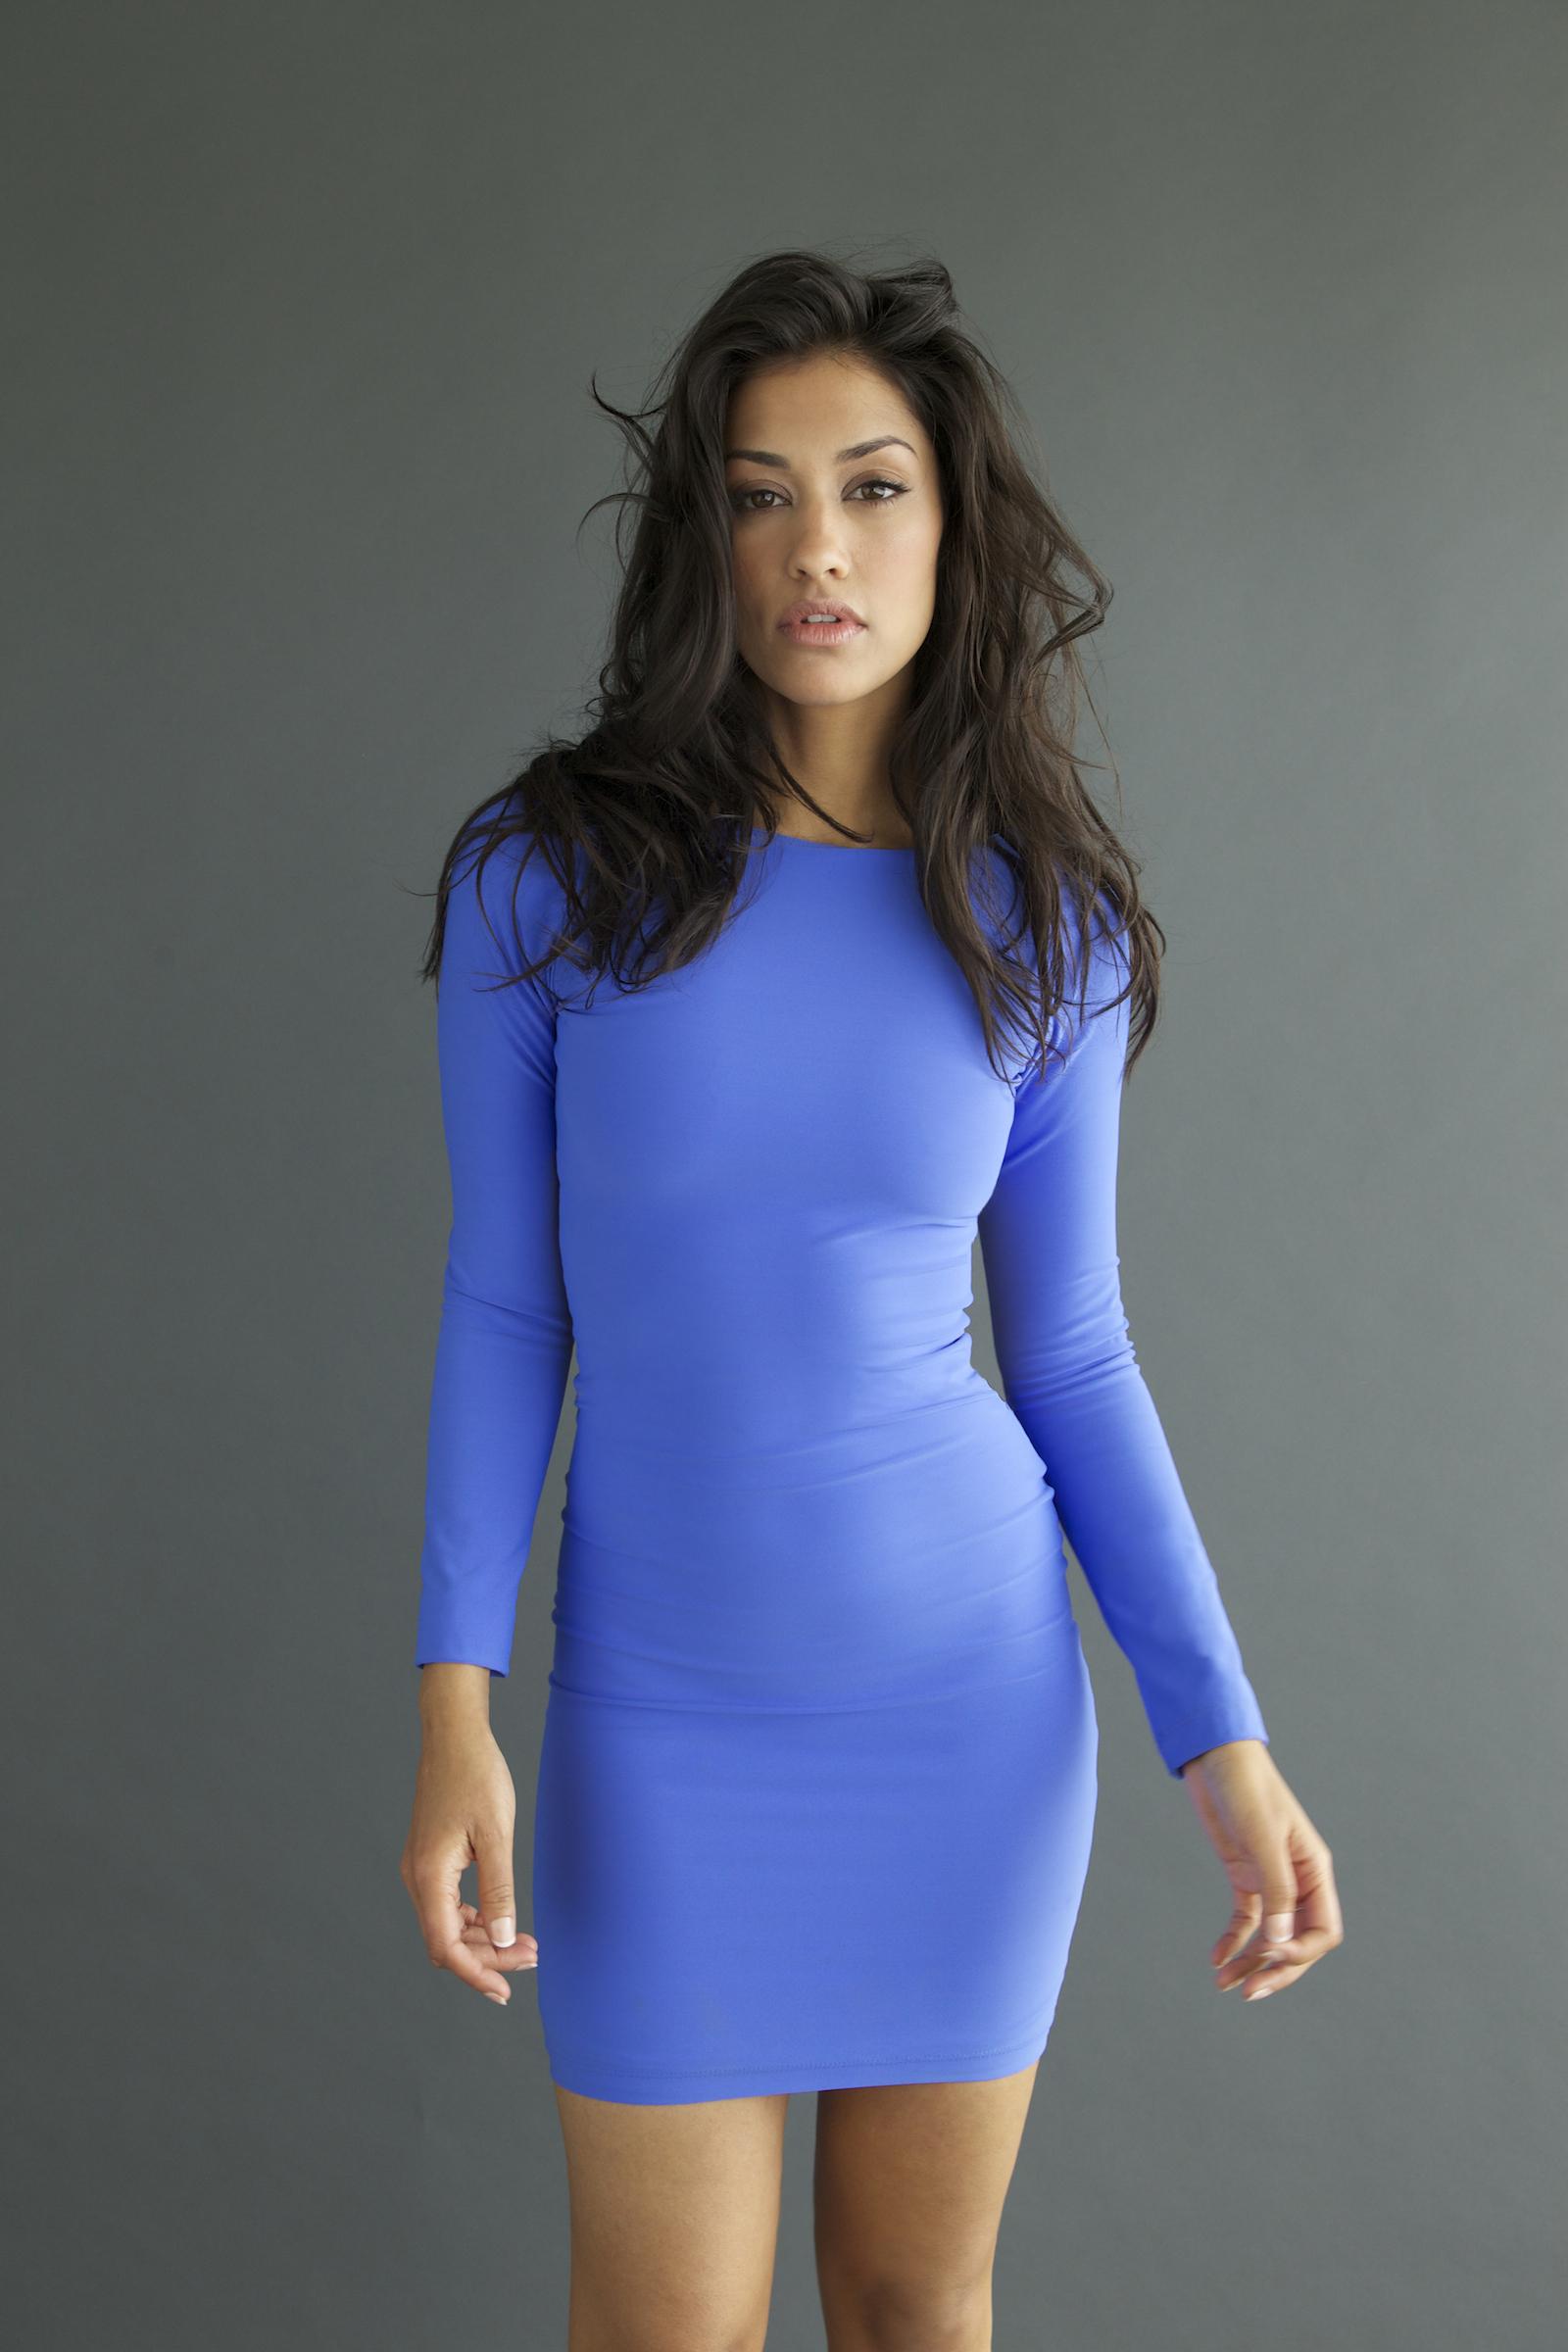 Janina Gavankar - IMDb